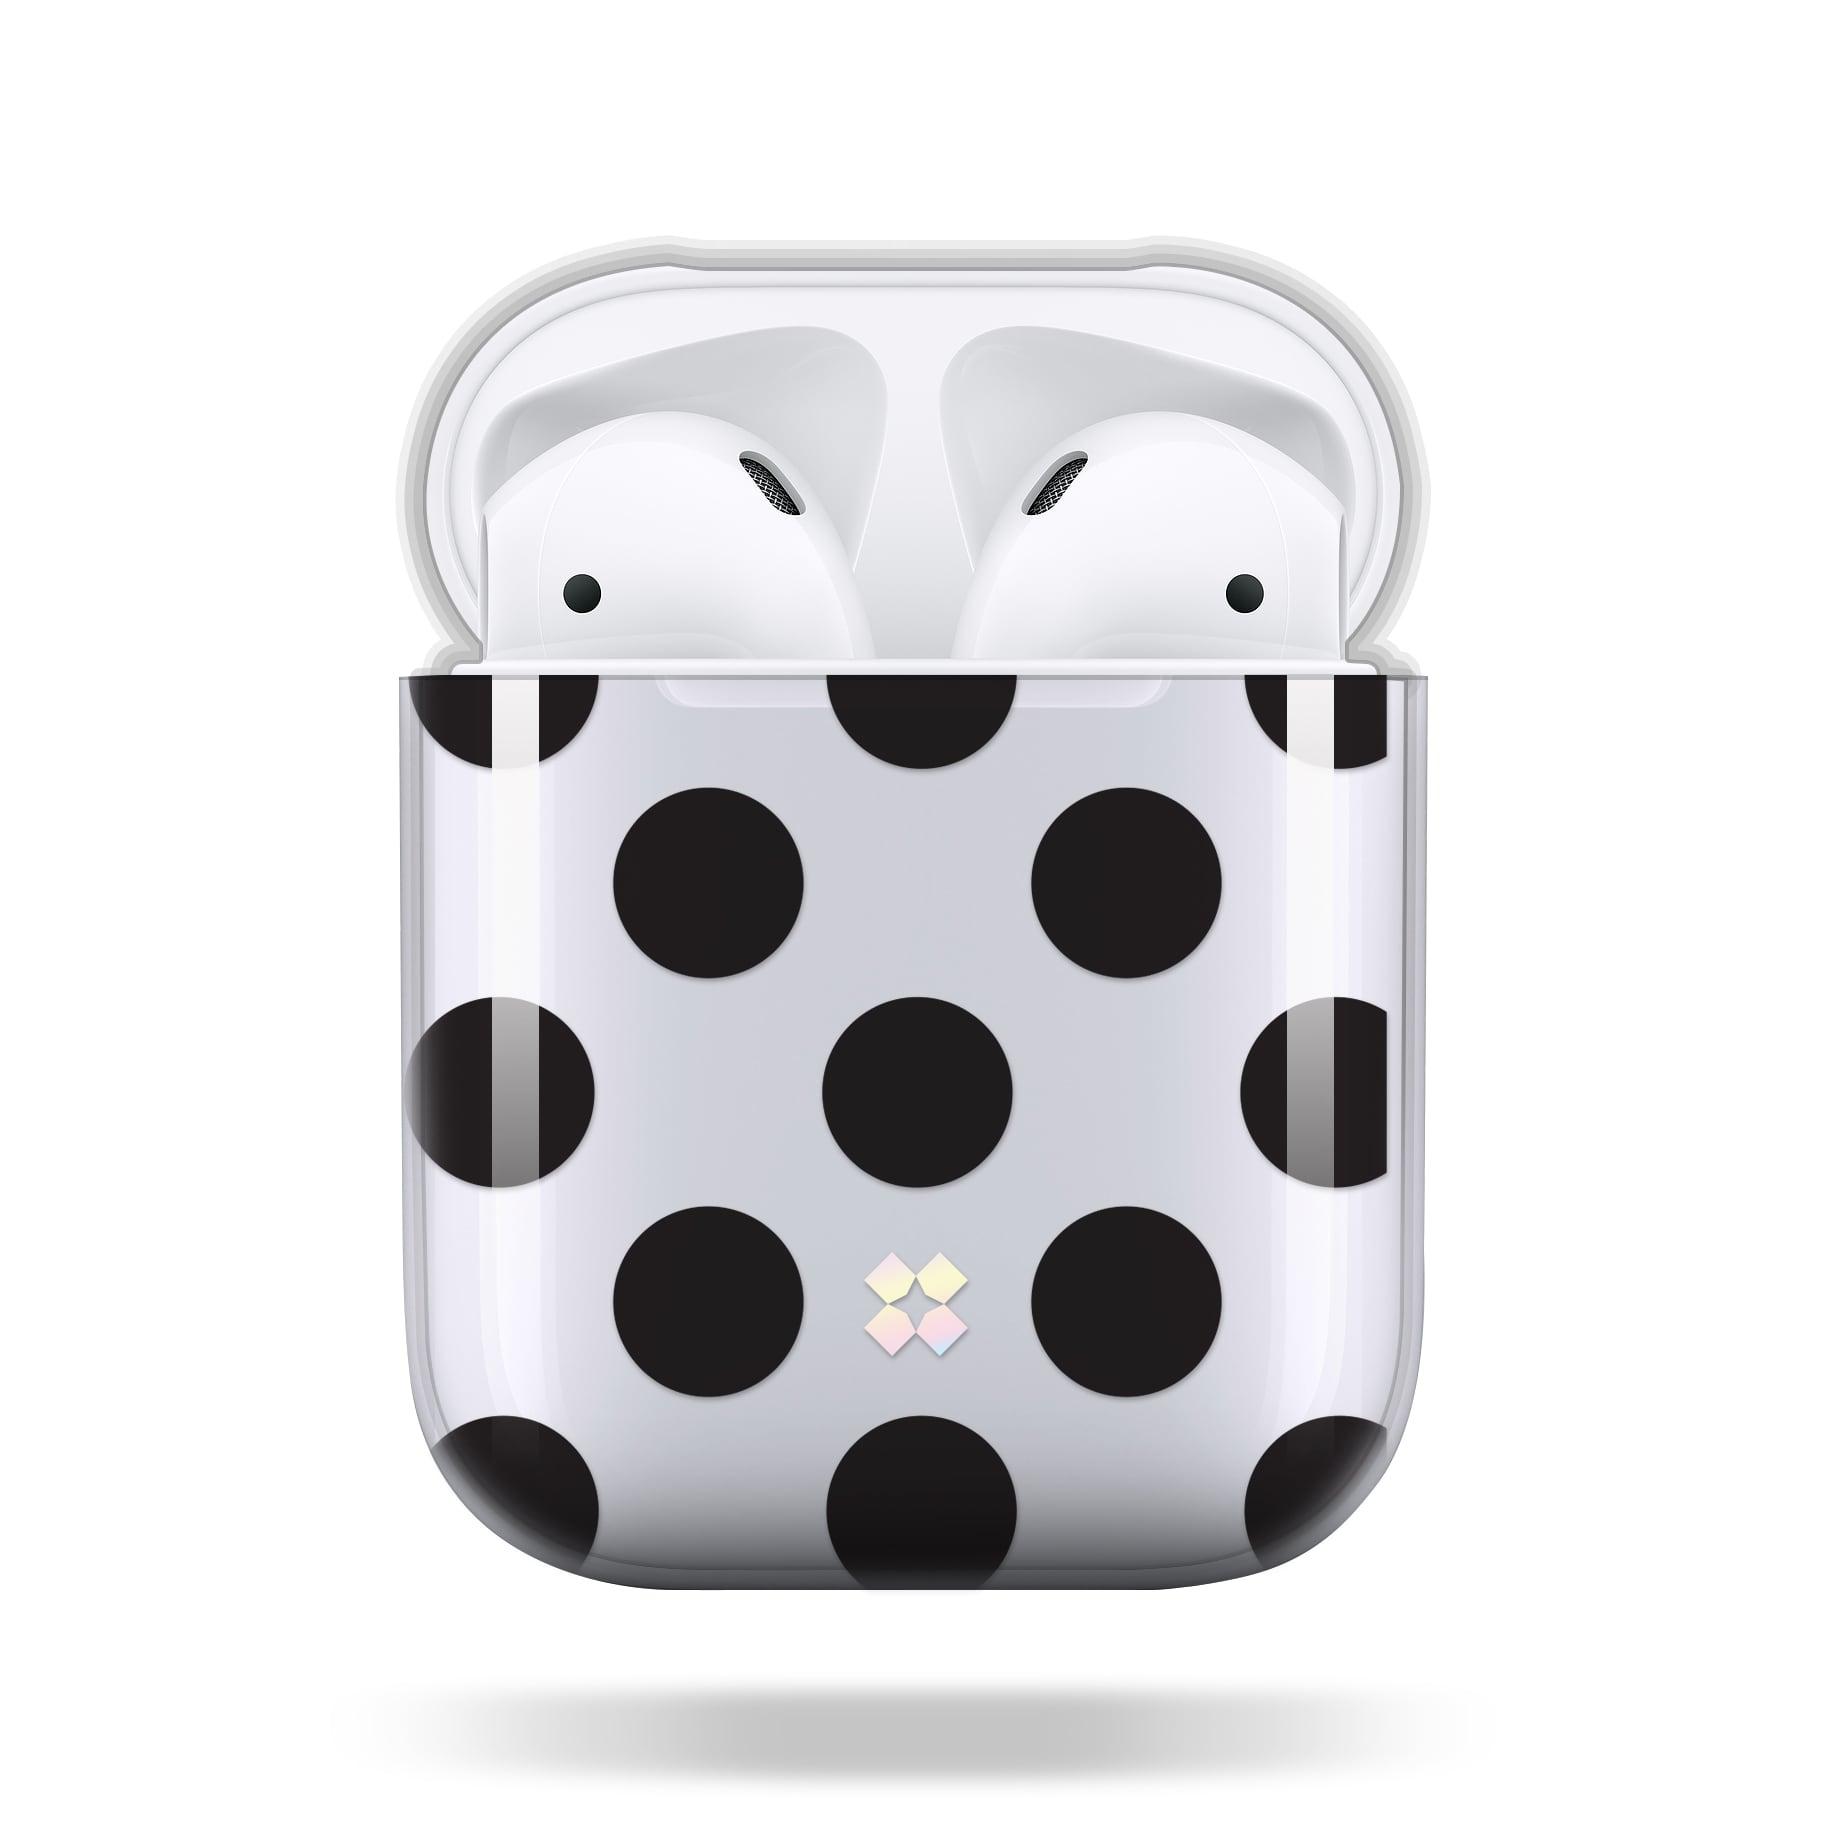 CaseStudi ケーススタディ PRISMART AirPods Case 2018 エアーポッズ ハード ケース 男女兼用ドット 水玉  Polka Dot 国内正規品